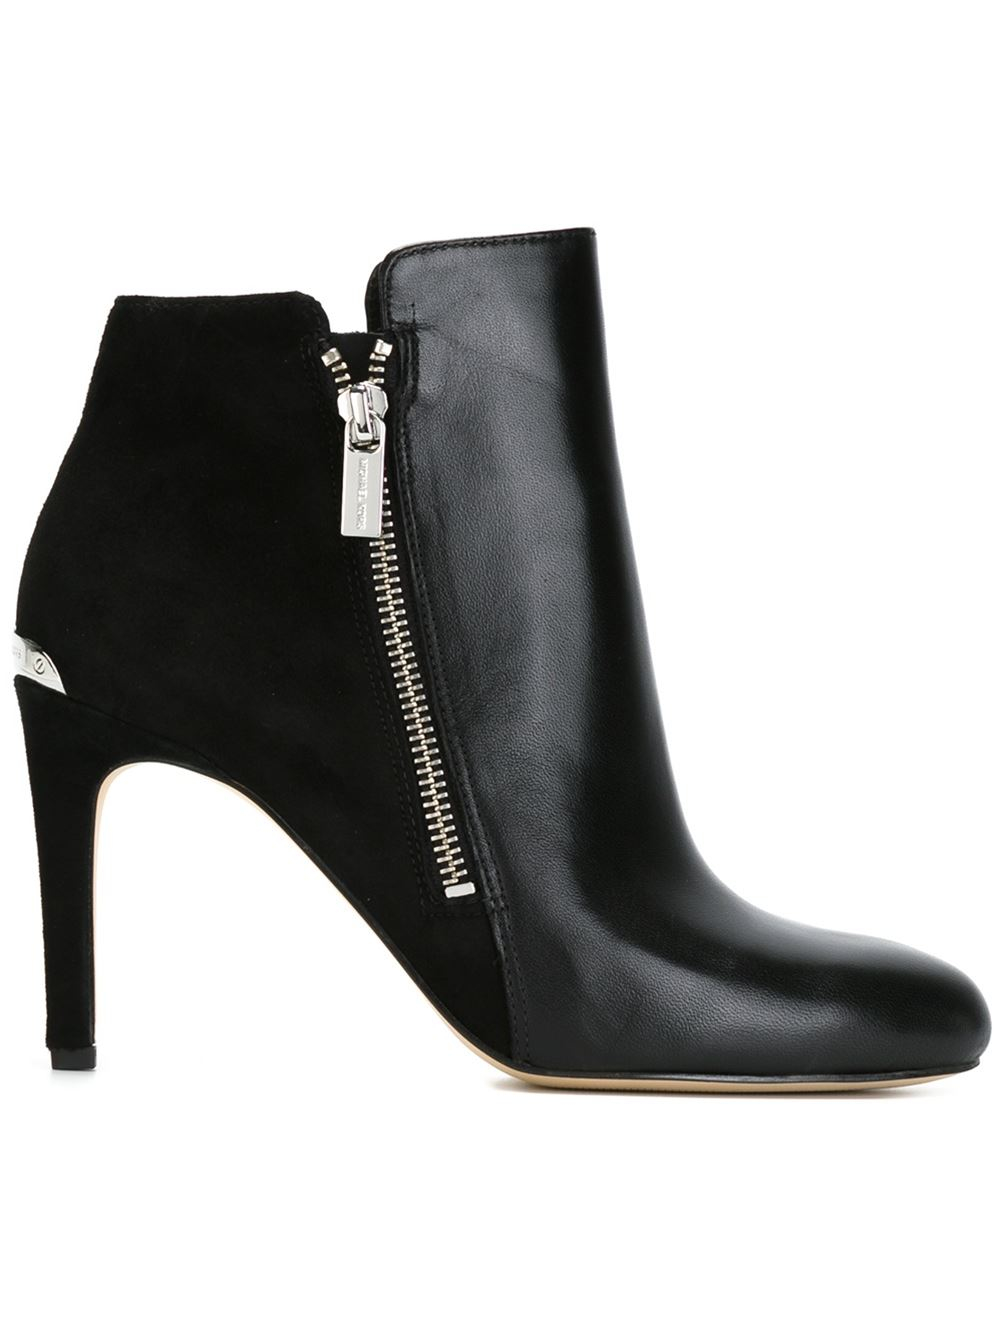 michael michael kors stiletto ankle boots in black lyst. Black Bedroom Furniture Sets. Home Design Ideas